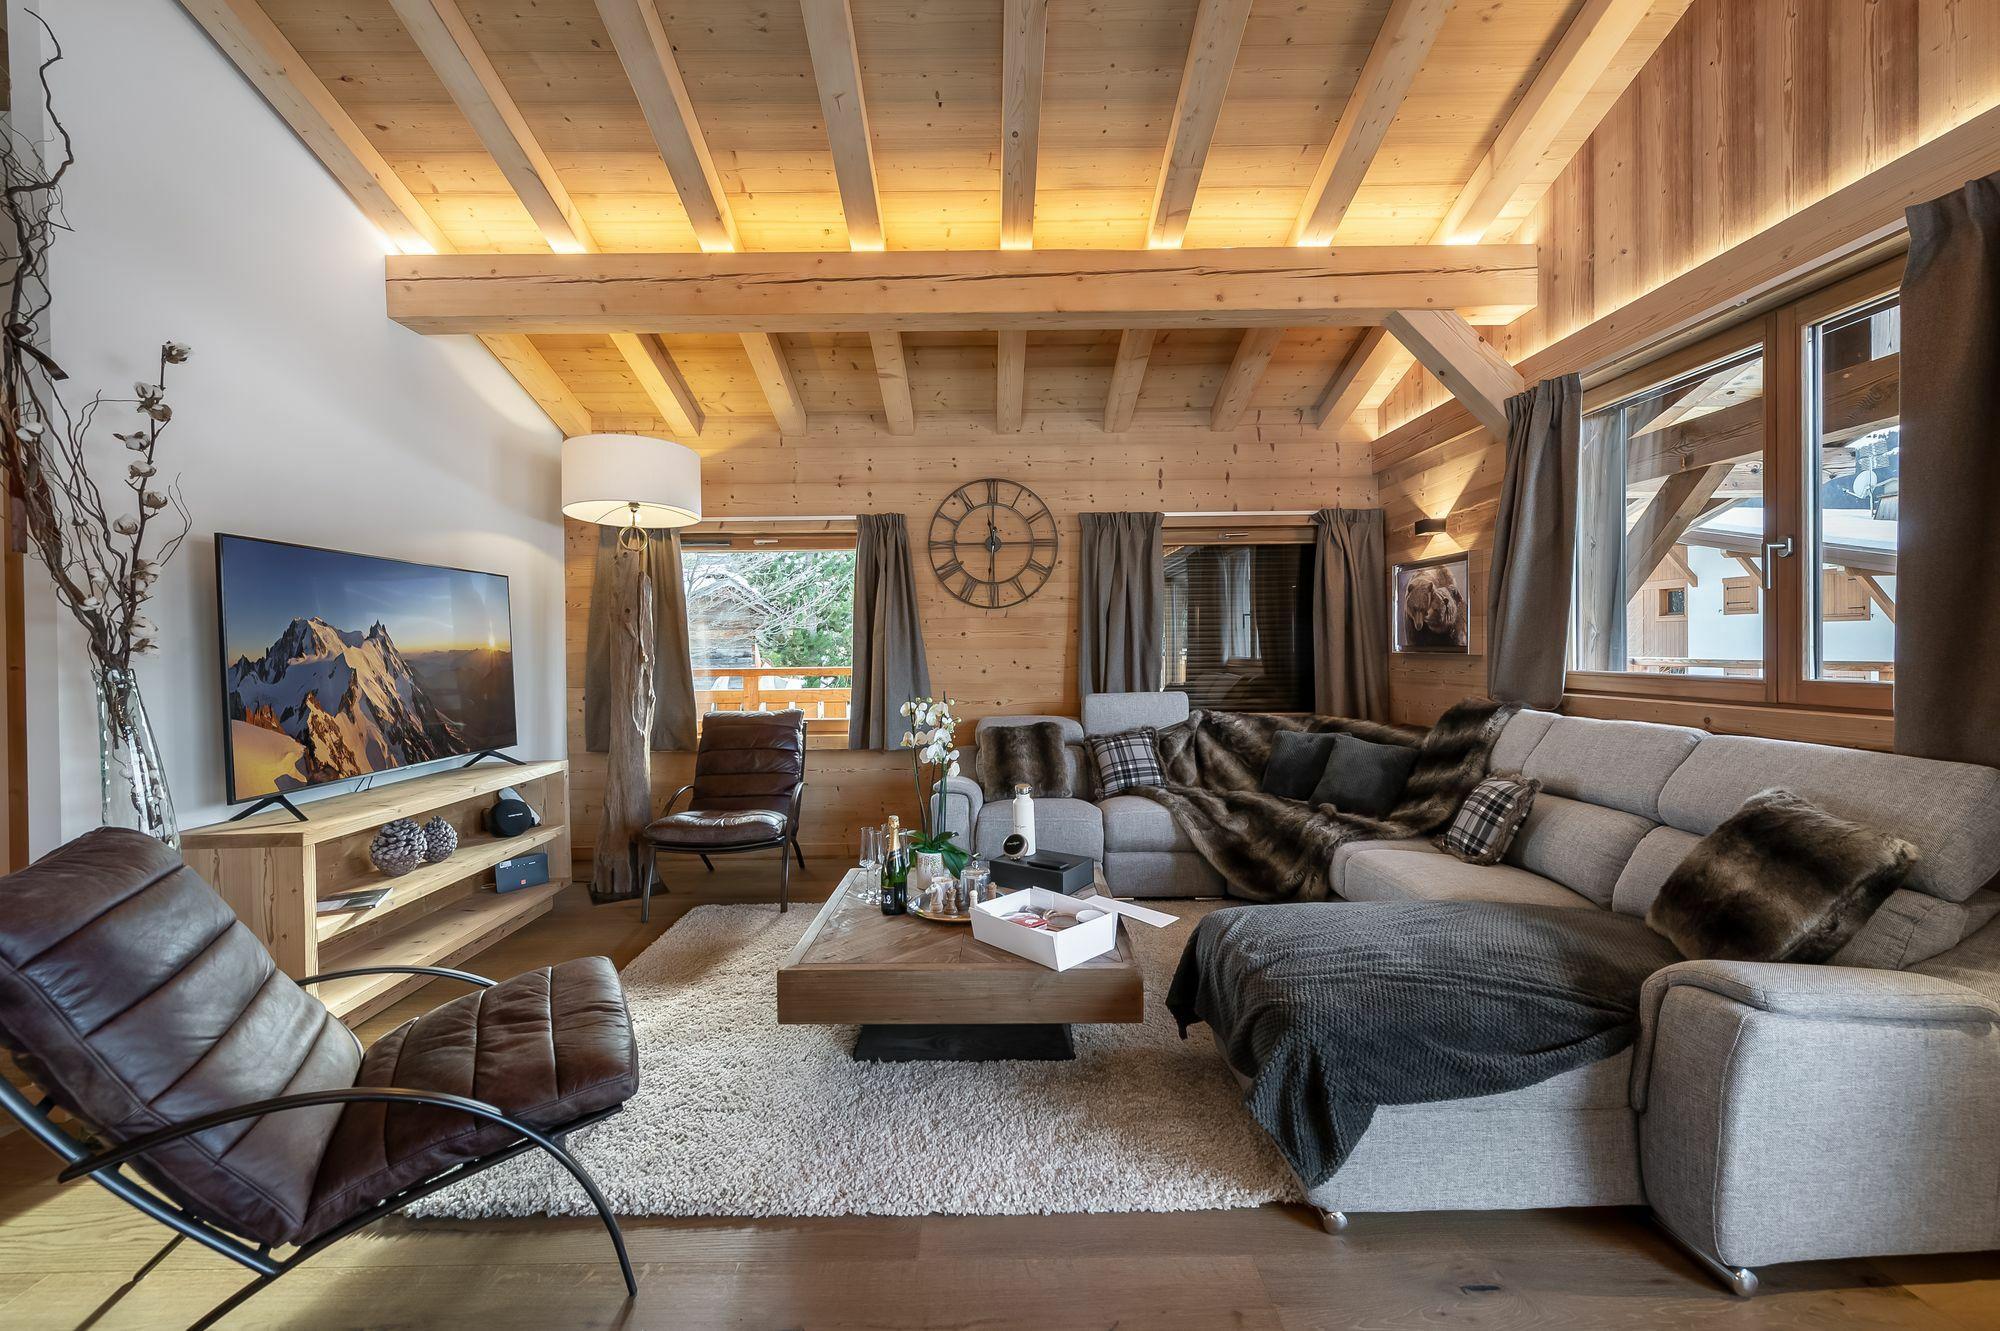 Leonas Accommodation in Megeve